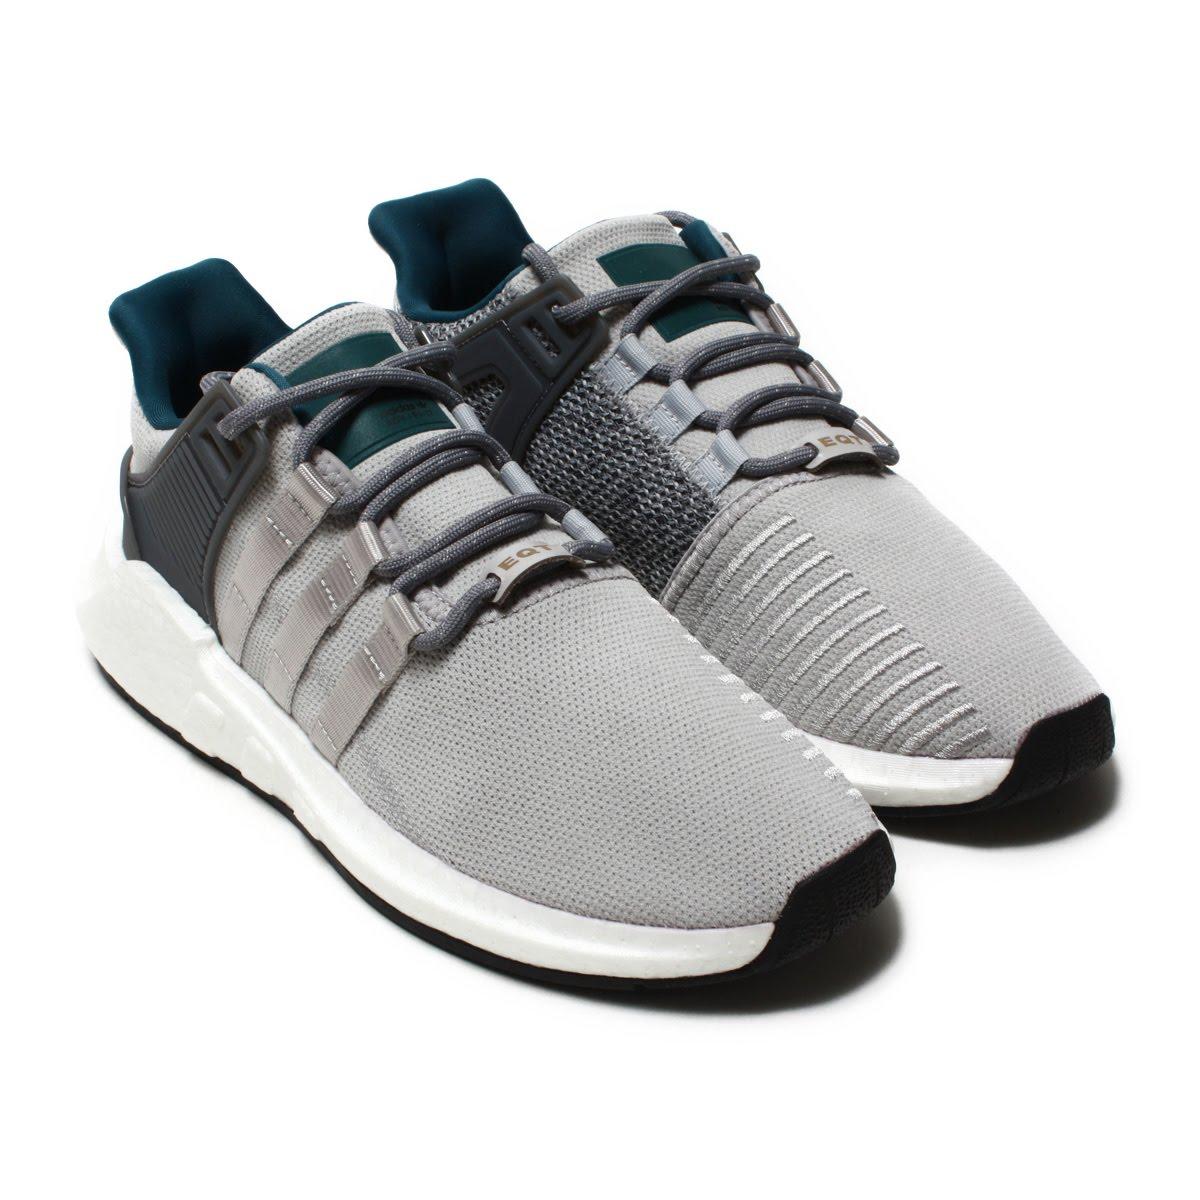 adidas Originals EQT SUPPORT 93/17 (アディダス オリジナルス イーキューティー サポート 93/17)Grey/Grey/Grey【メンズ スニーカー】18SS-I